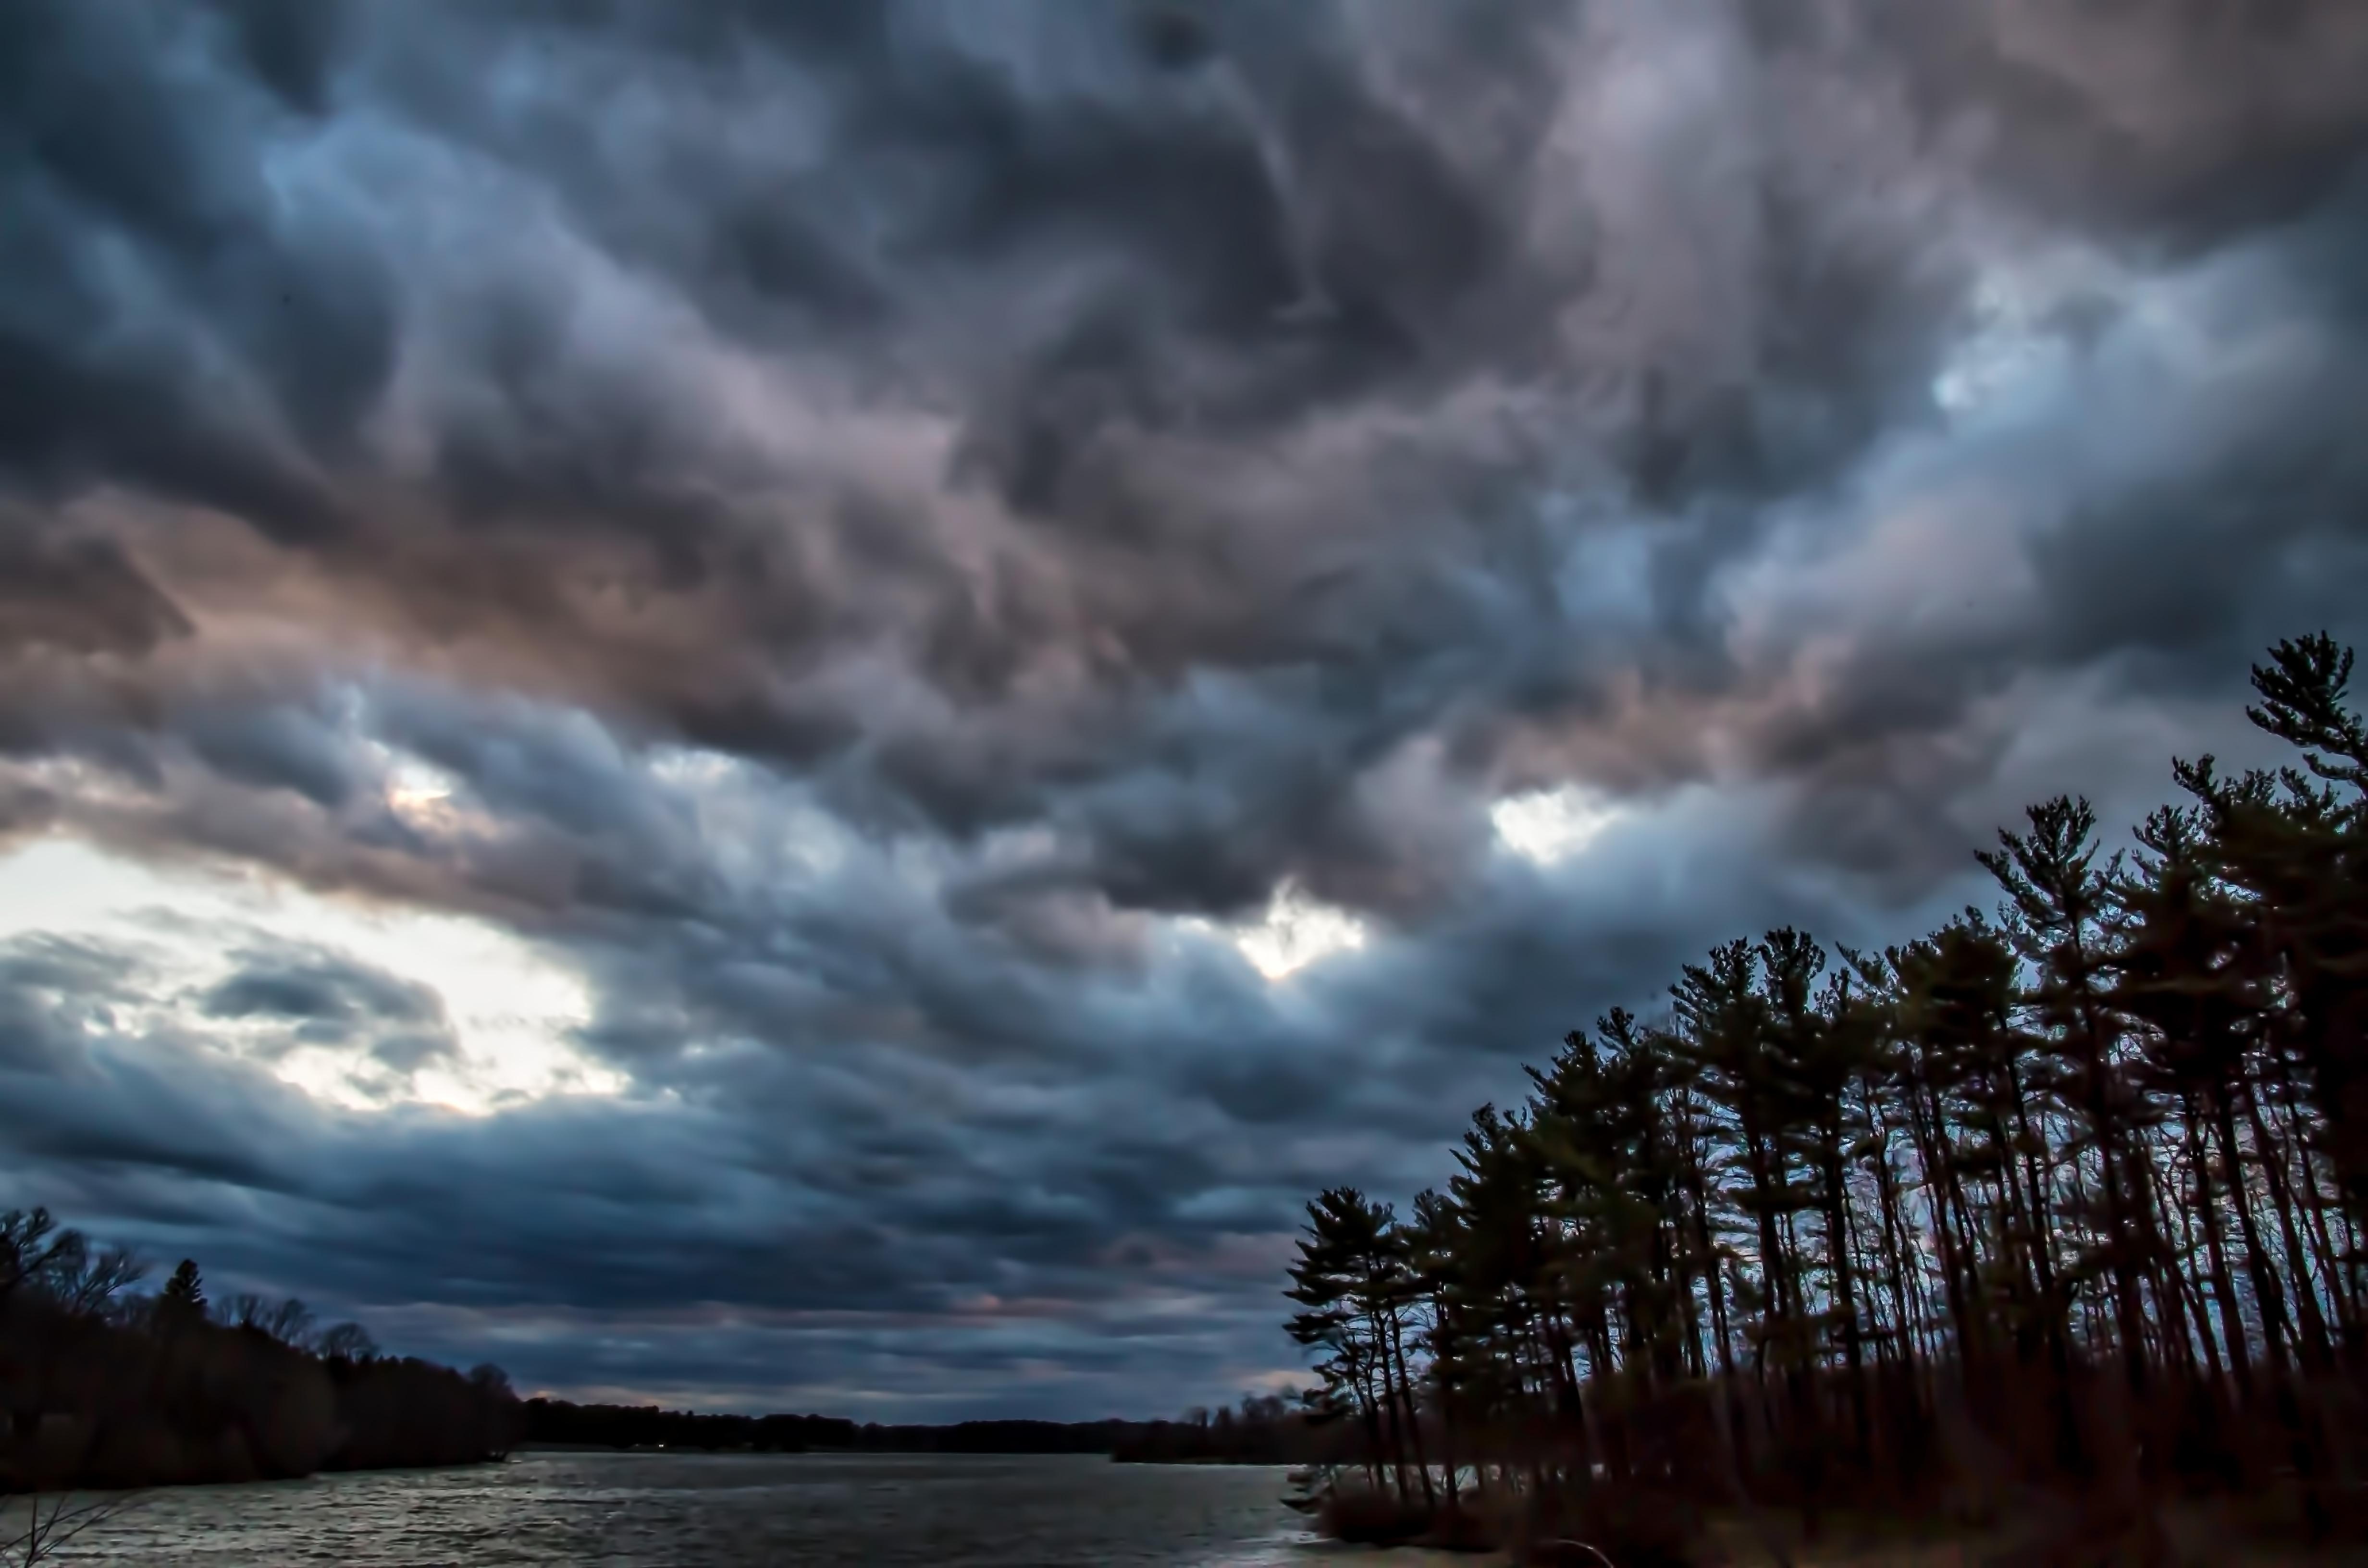 Wallpaper Sunlight Landscape Dark Sunset Sea Lake Water Nature Reflection Sky Outdoors Clouds Calm Storm Evening River Horizon